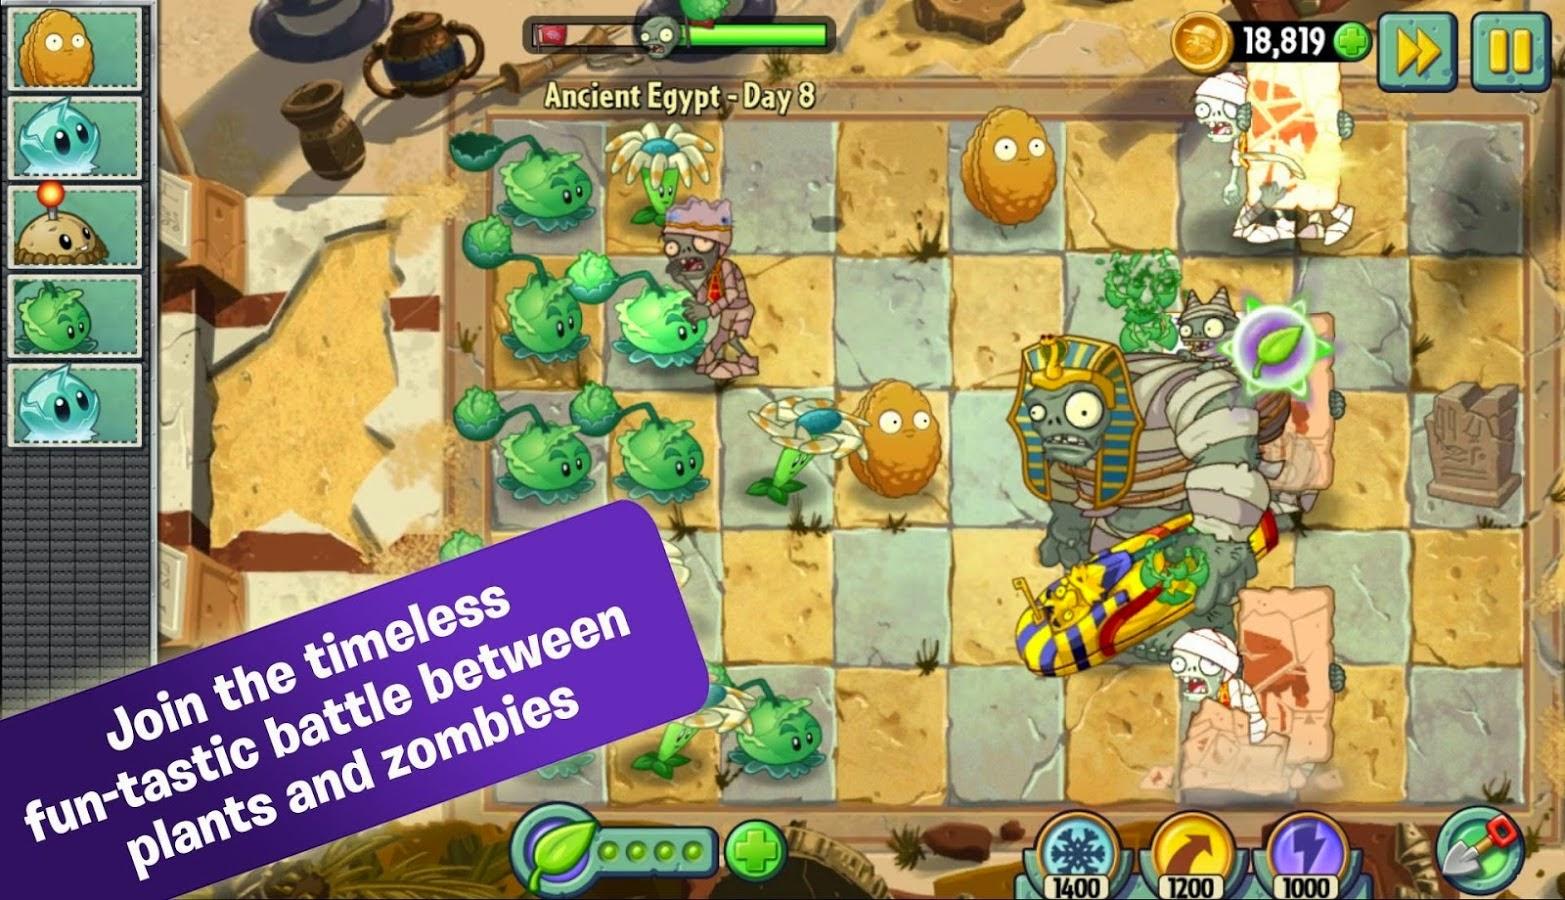 http://riedzz.blogspot.com/2014/10/daftar-terbaru-kumpulan-game-offline-android-terbaik-2014.html